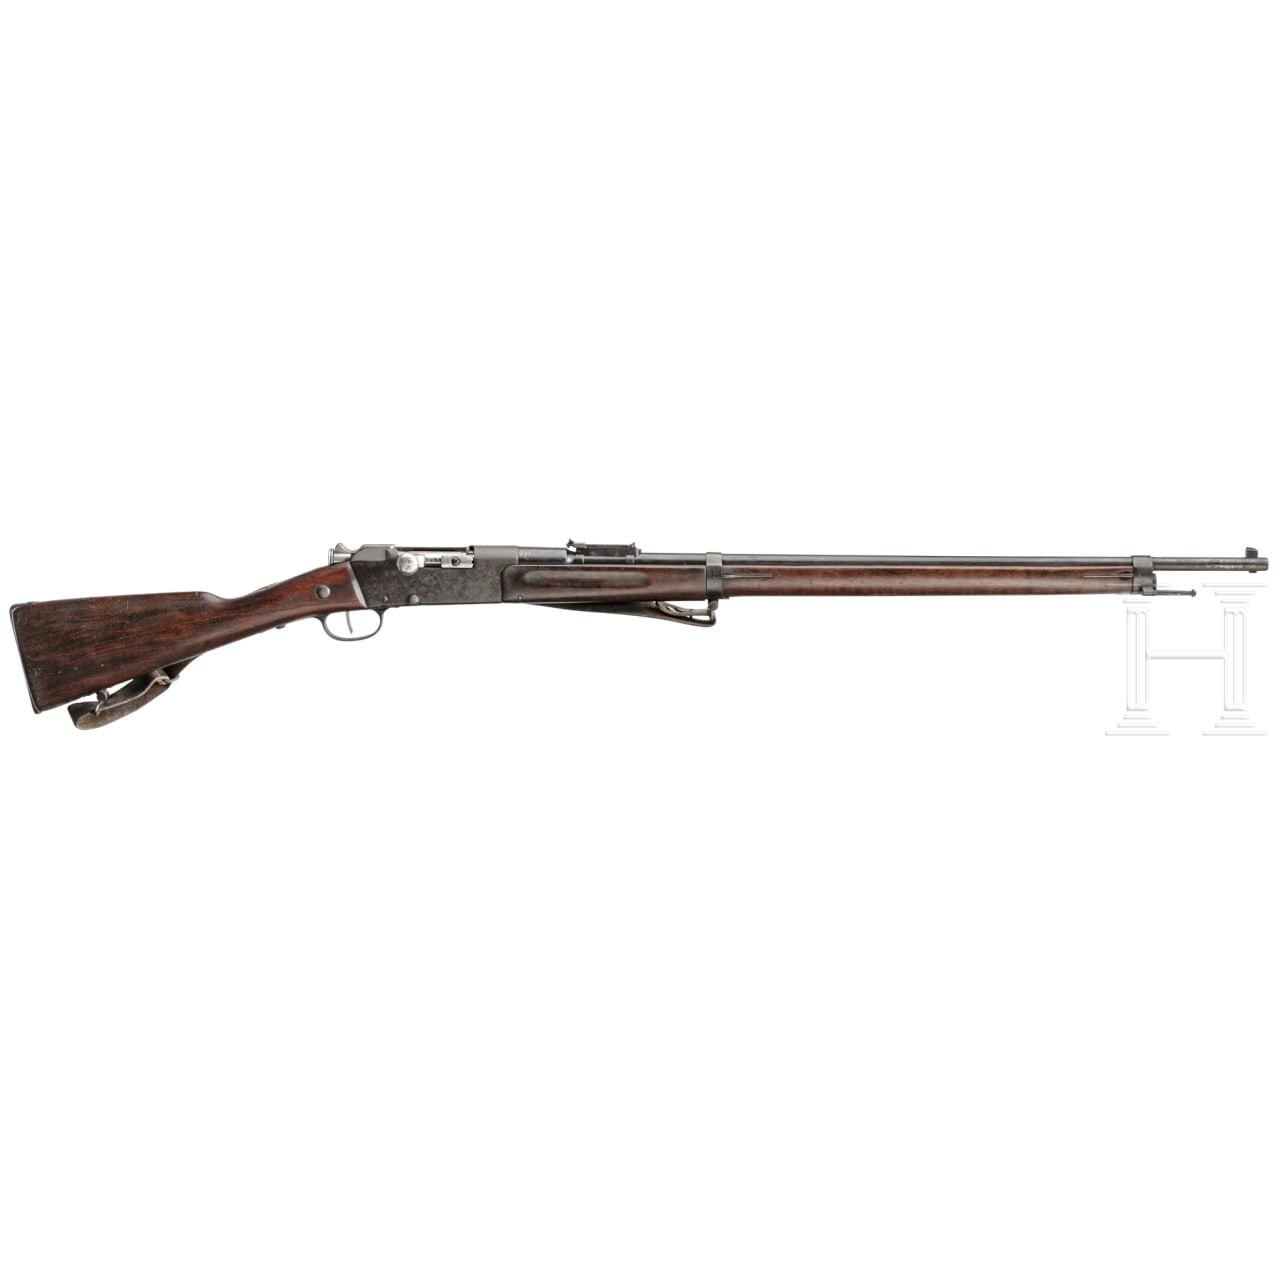 Fusil Lebel Mle 1886/93